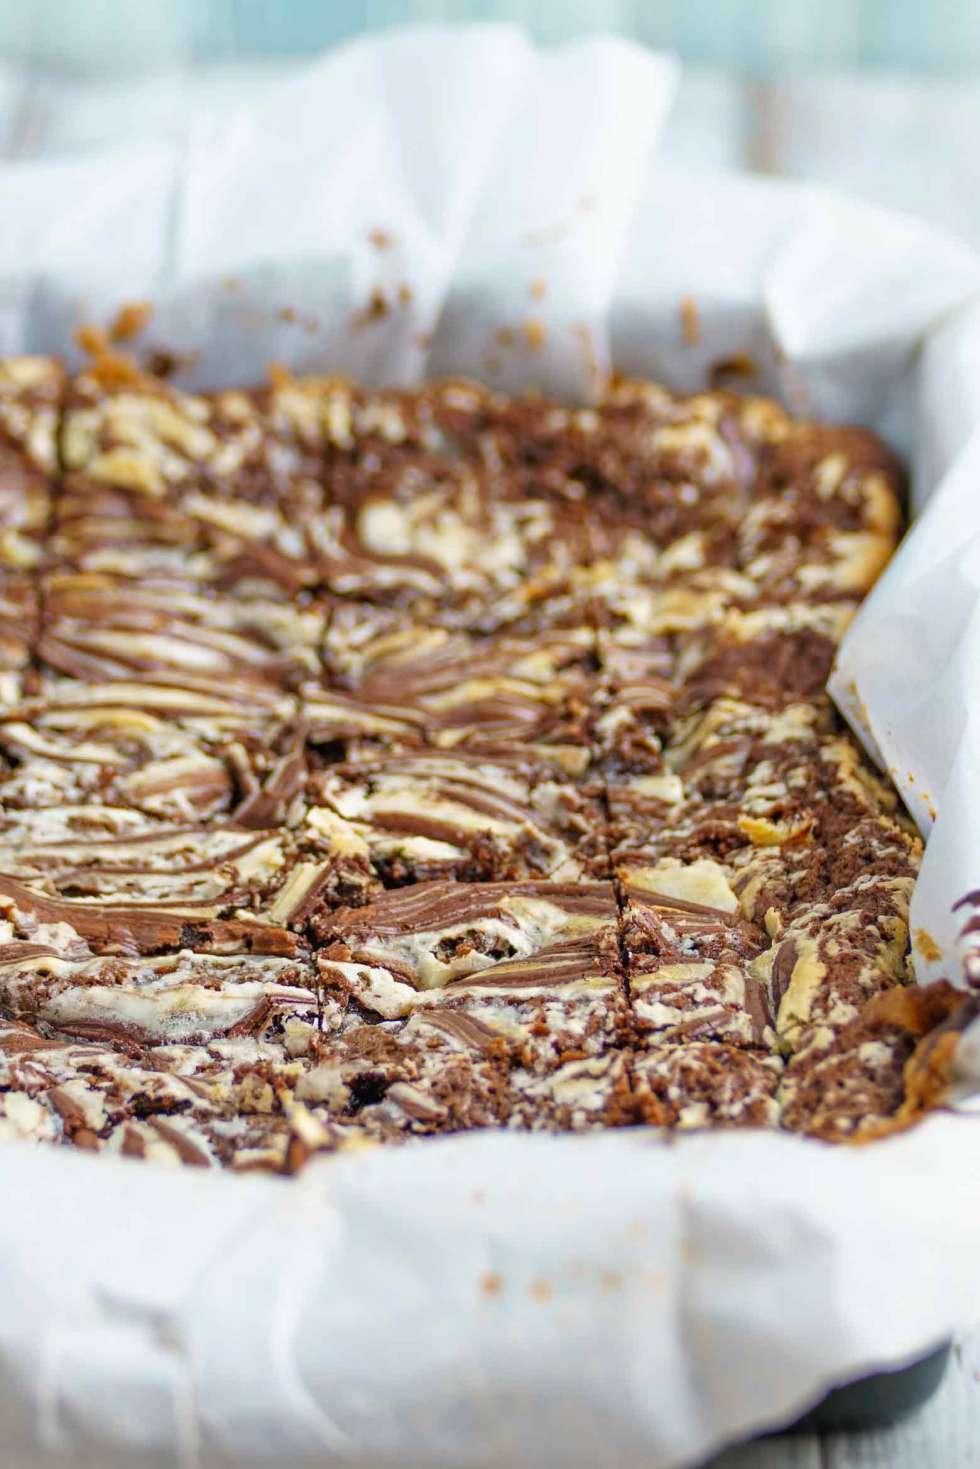 A pan of chocolate ginger cheesecake bars